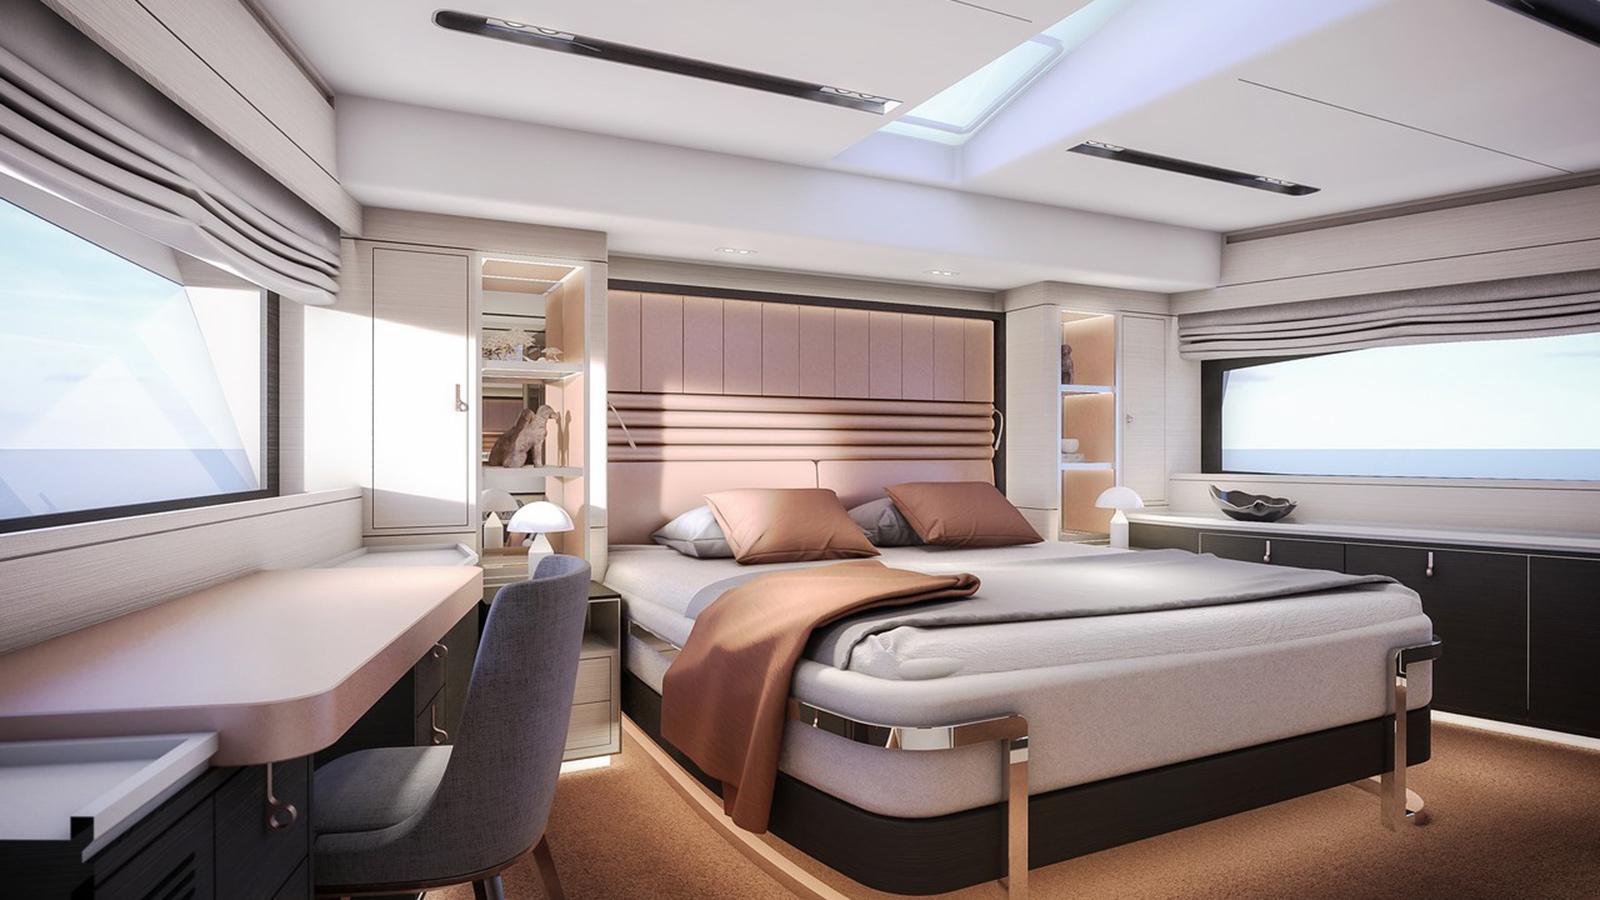 Https Yachts News Horizon Unveils How To Tie A Double Windsor Knot Diagram Car Interior Design Yp7y7tbysie7m92q54ik Horizon773 2560x1440